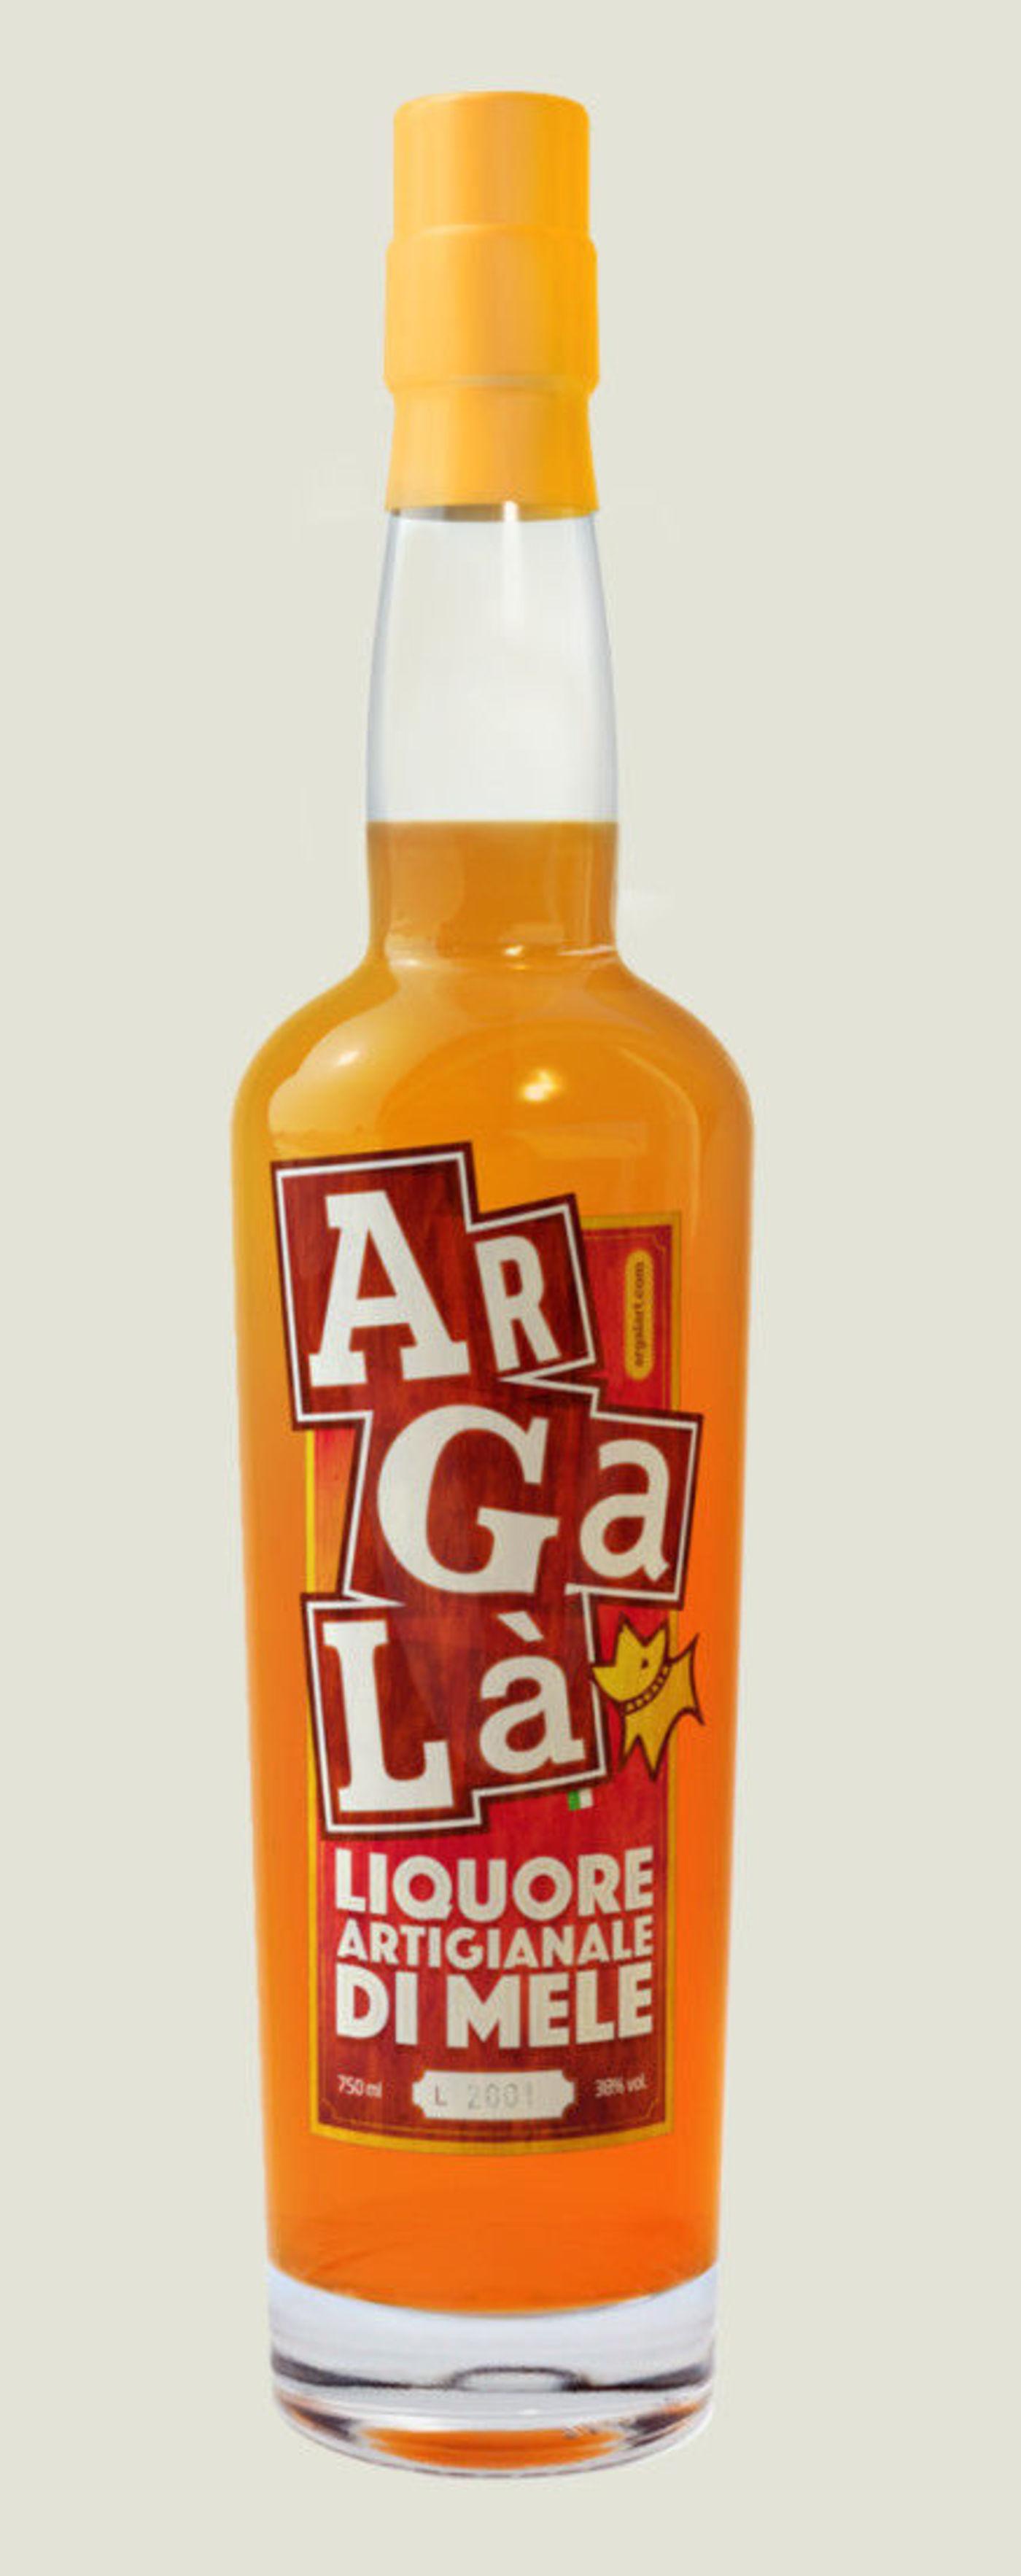 Simple liquor bottles